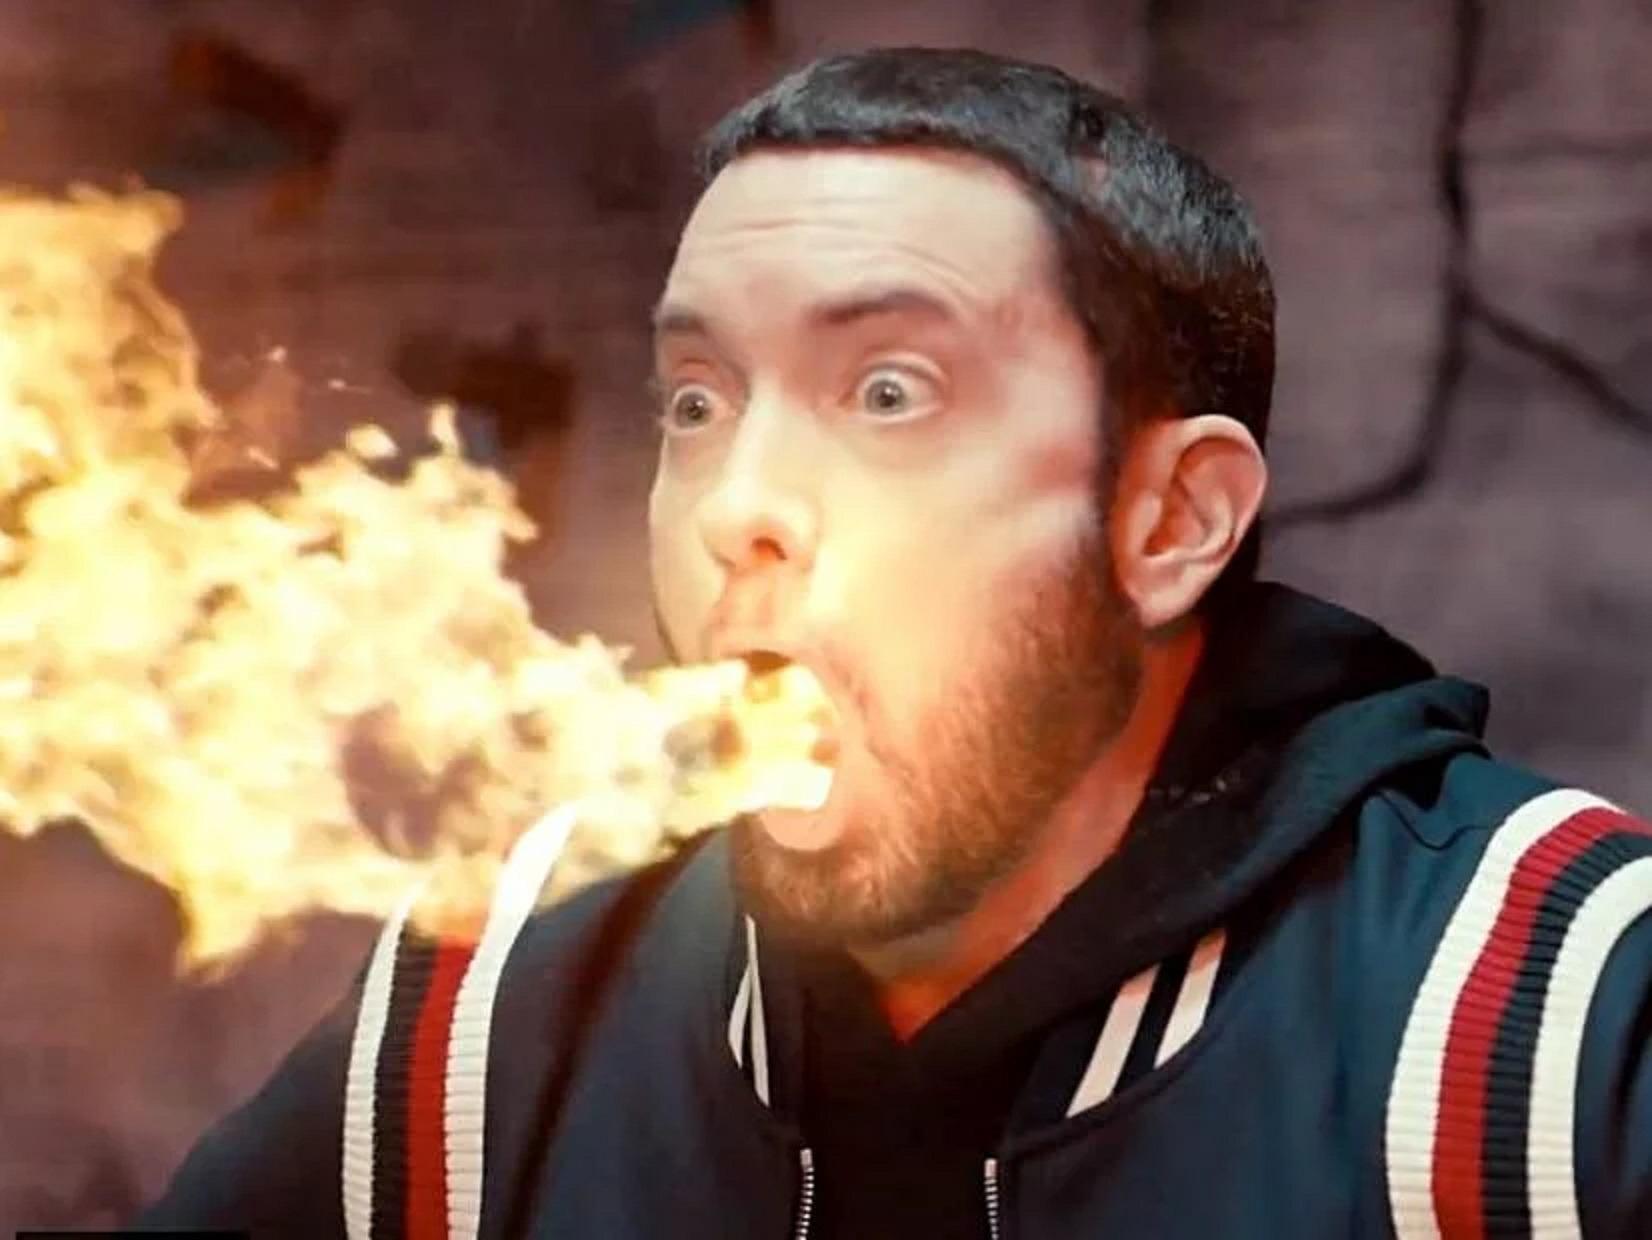 Eminem Godzilla Ft Juice Wrld Audio Lyrics Video Download Mp3 Music Lyrics Music Video